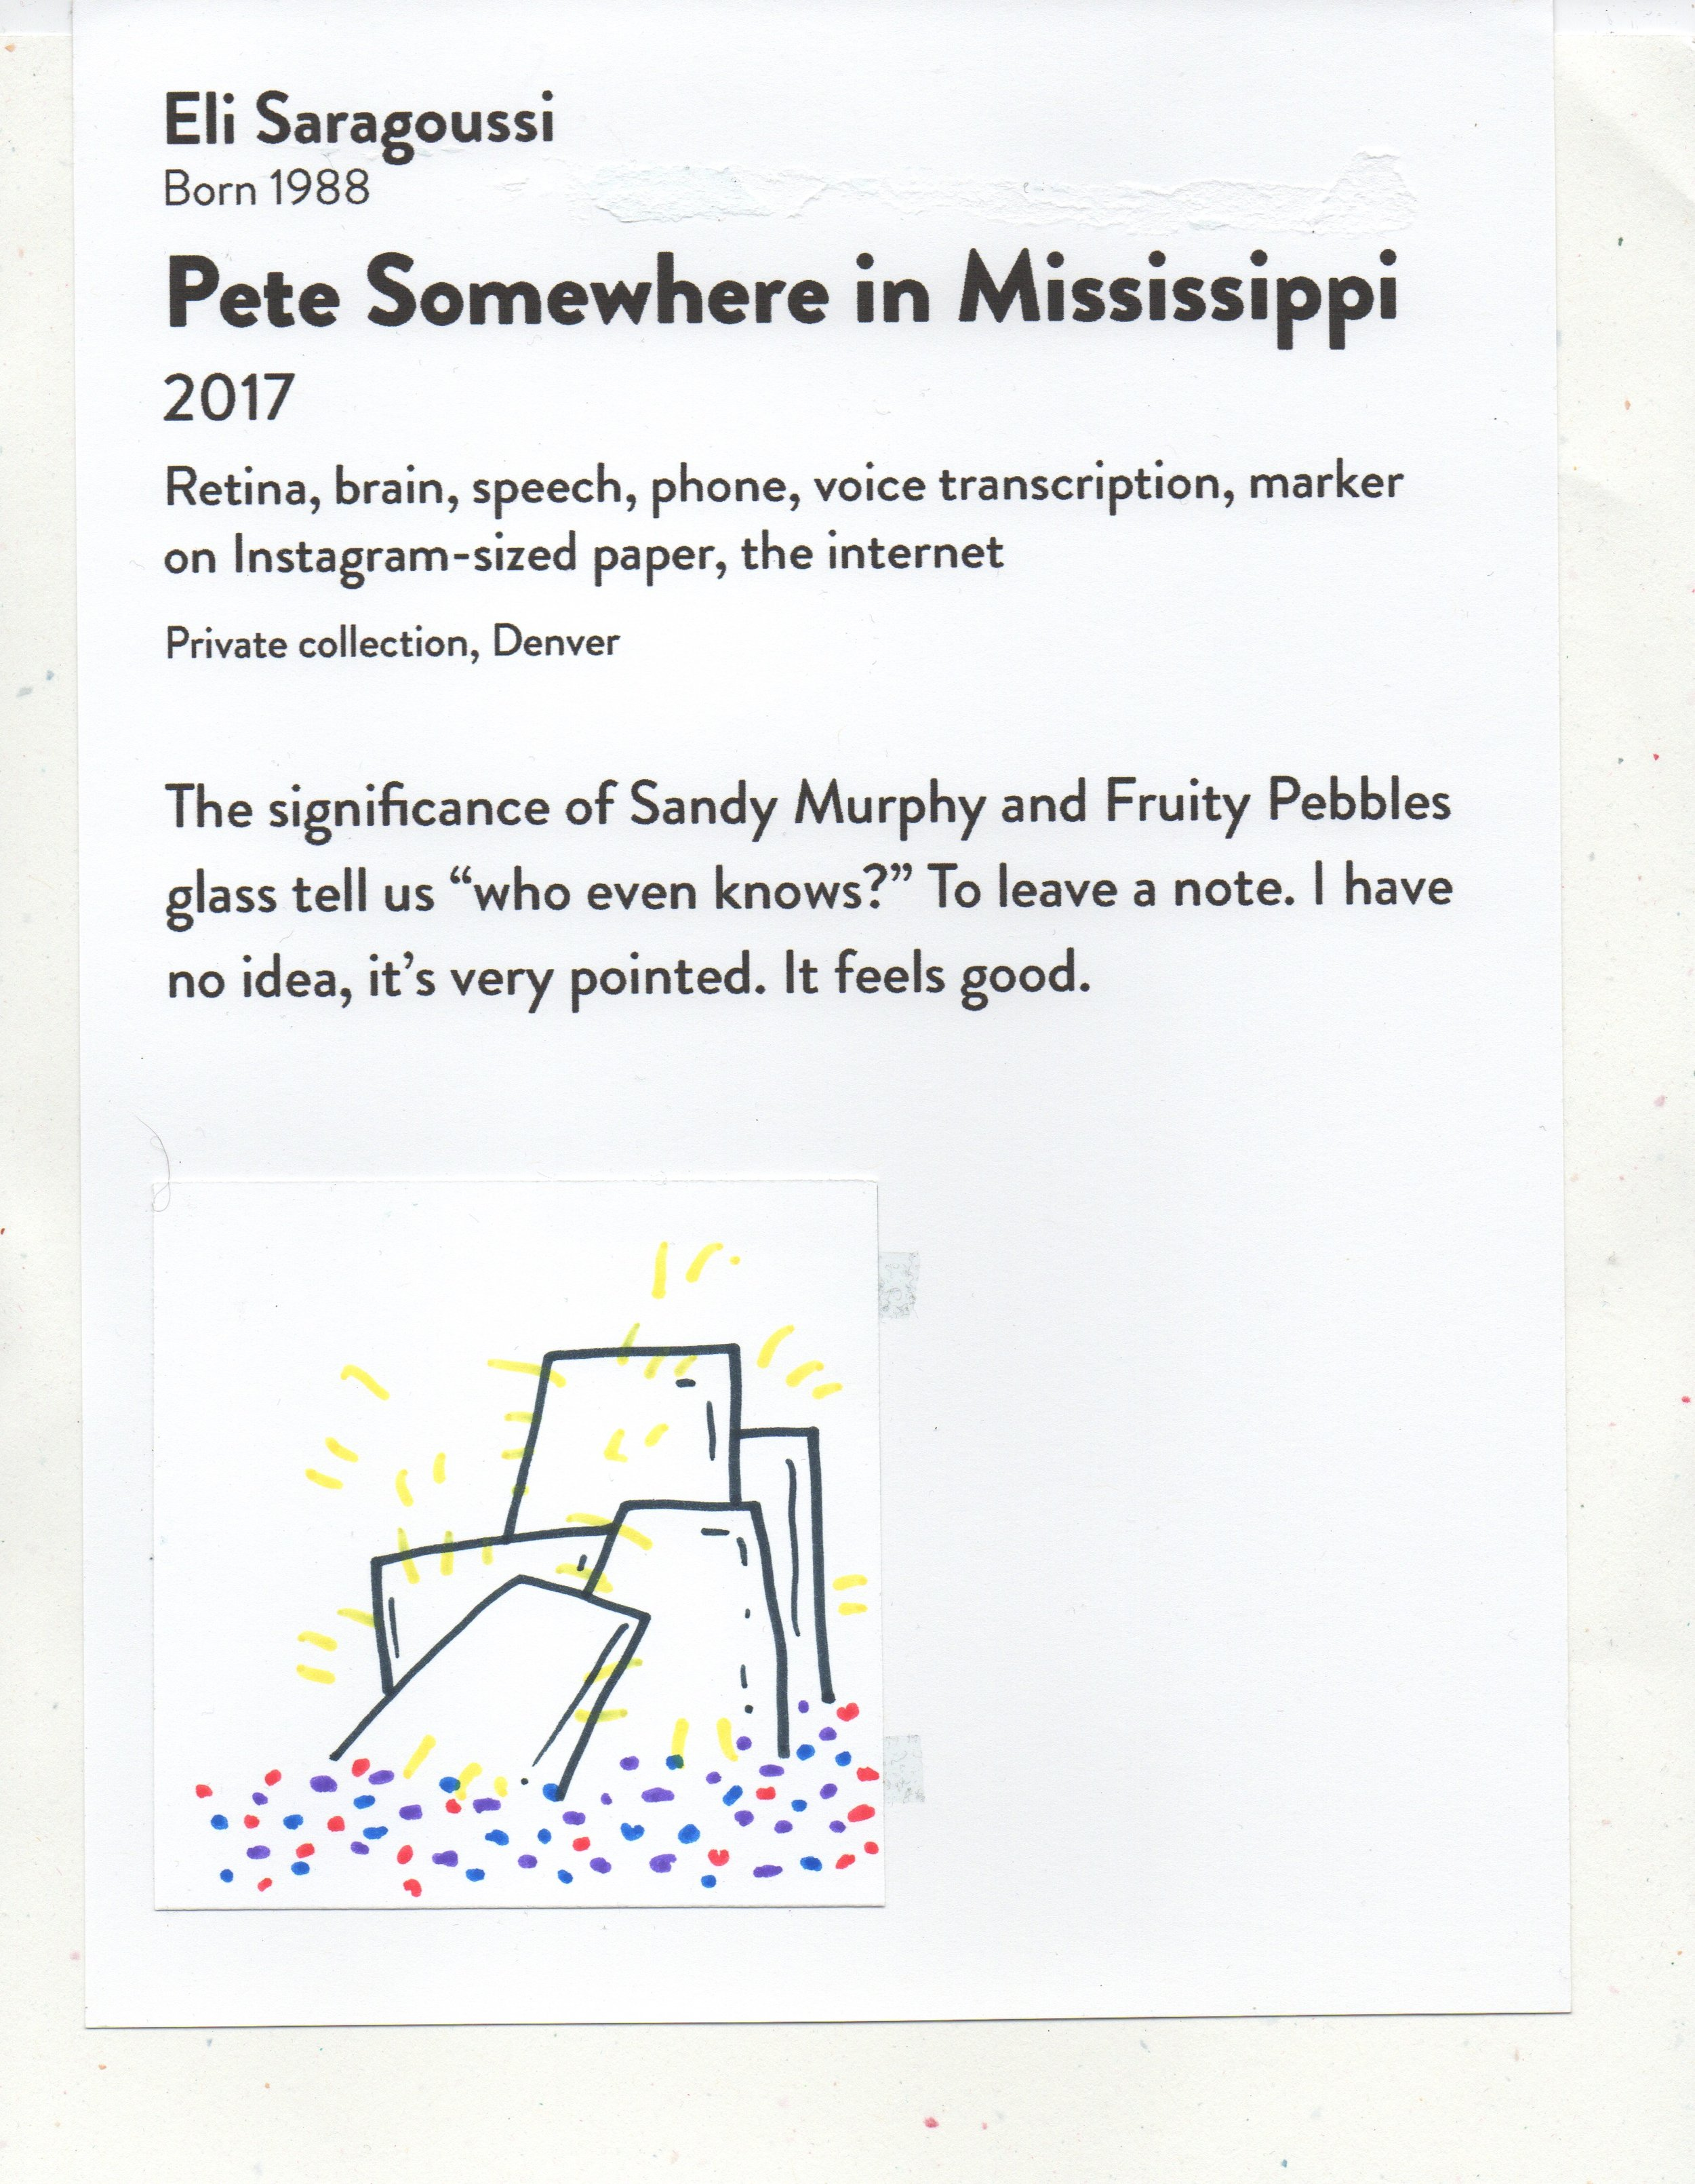 Pete Somewhere in Mississippi DAM Untitled April 28, 2017.jpeg